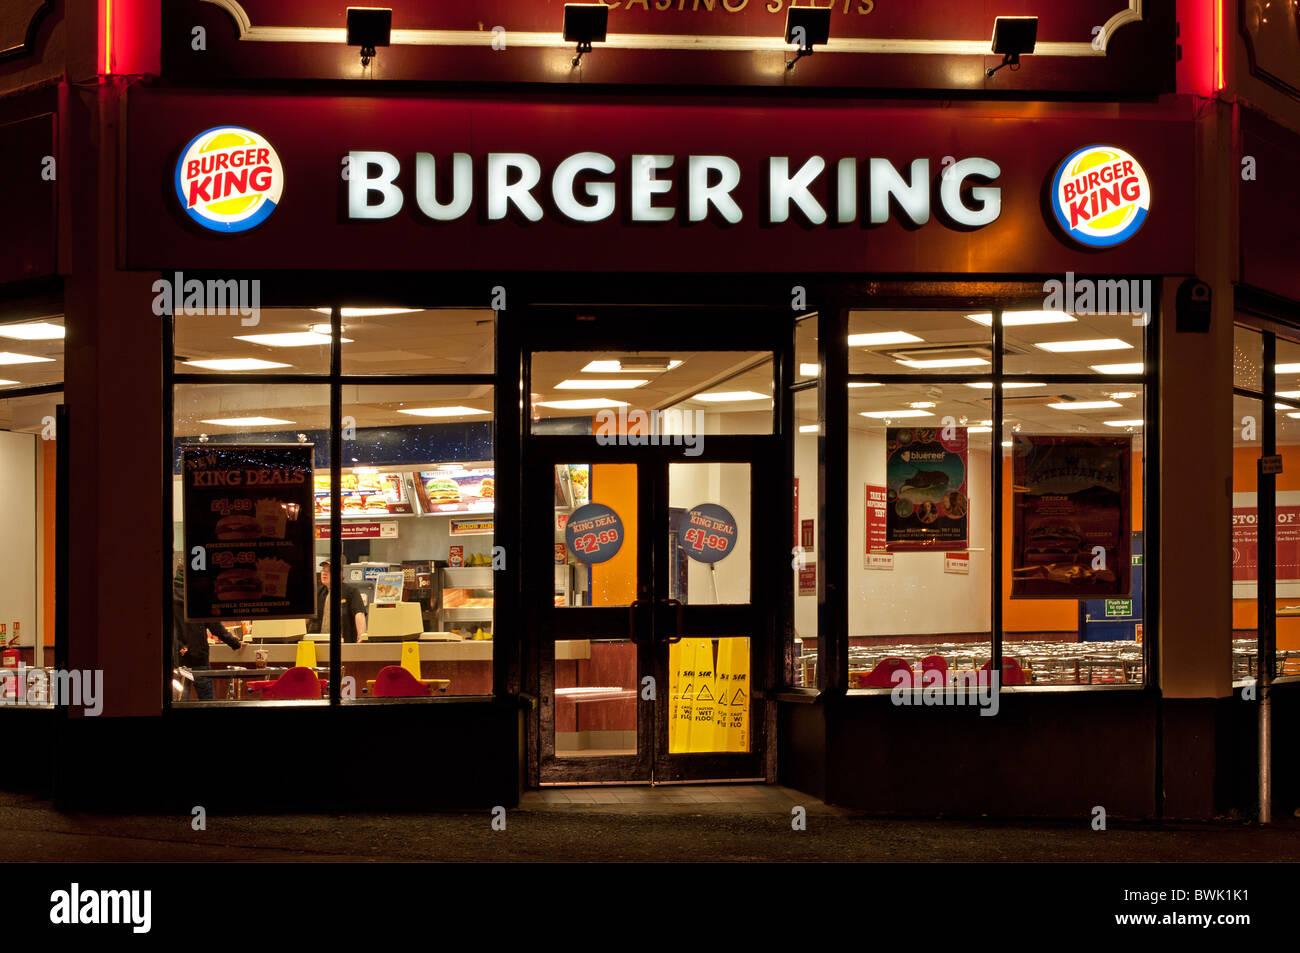 a burger king restuarant in cornwall, uk - Stock Image